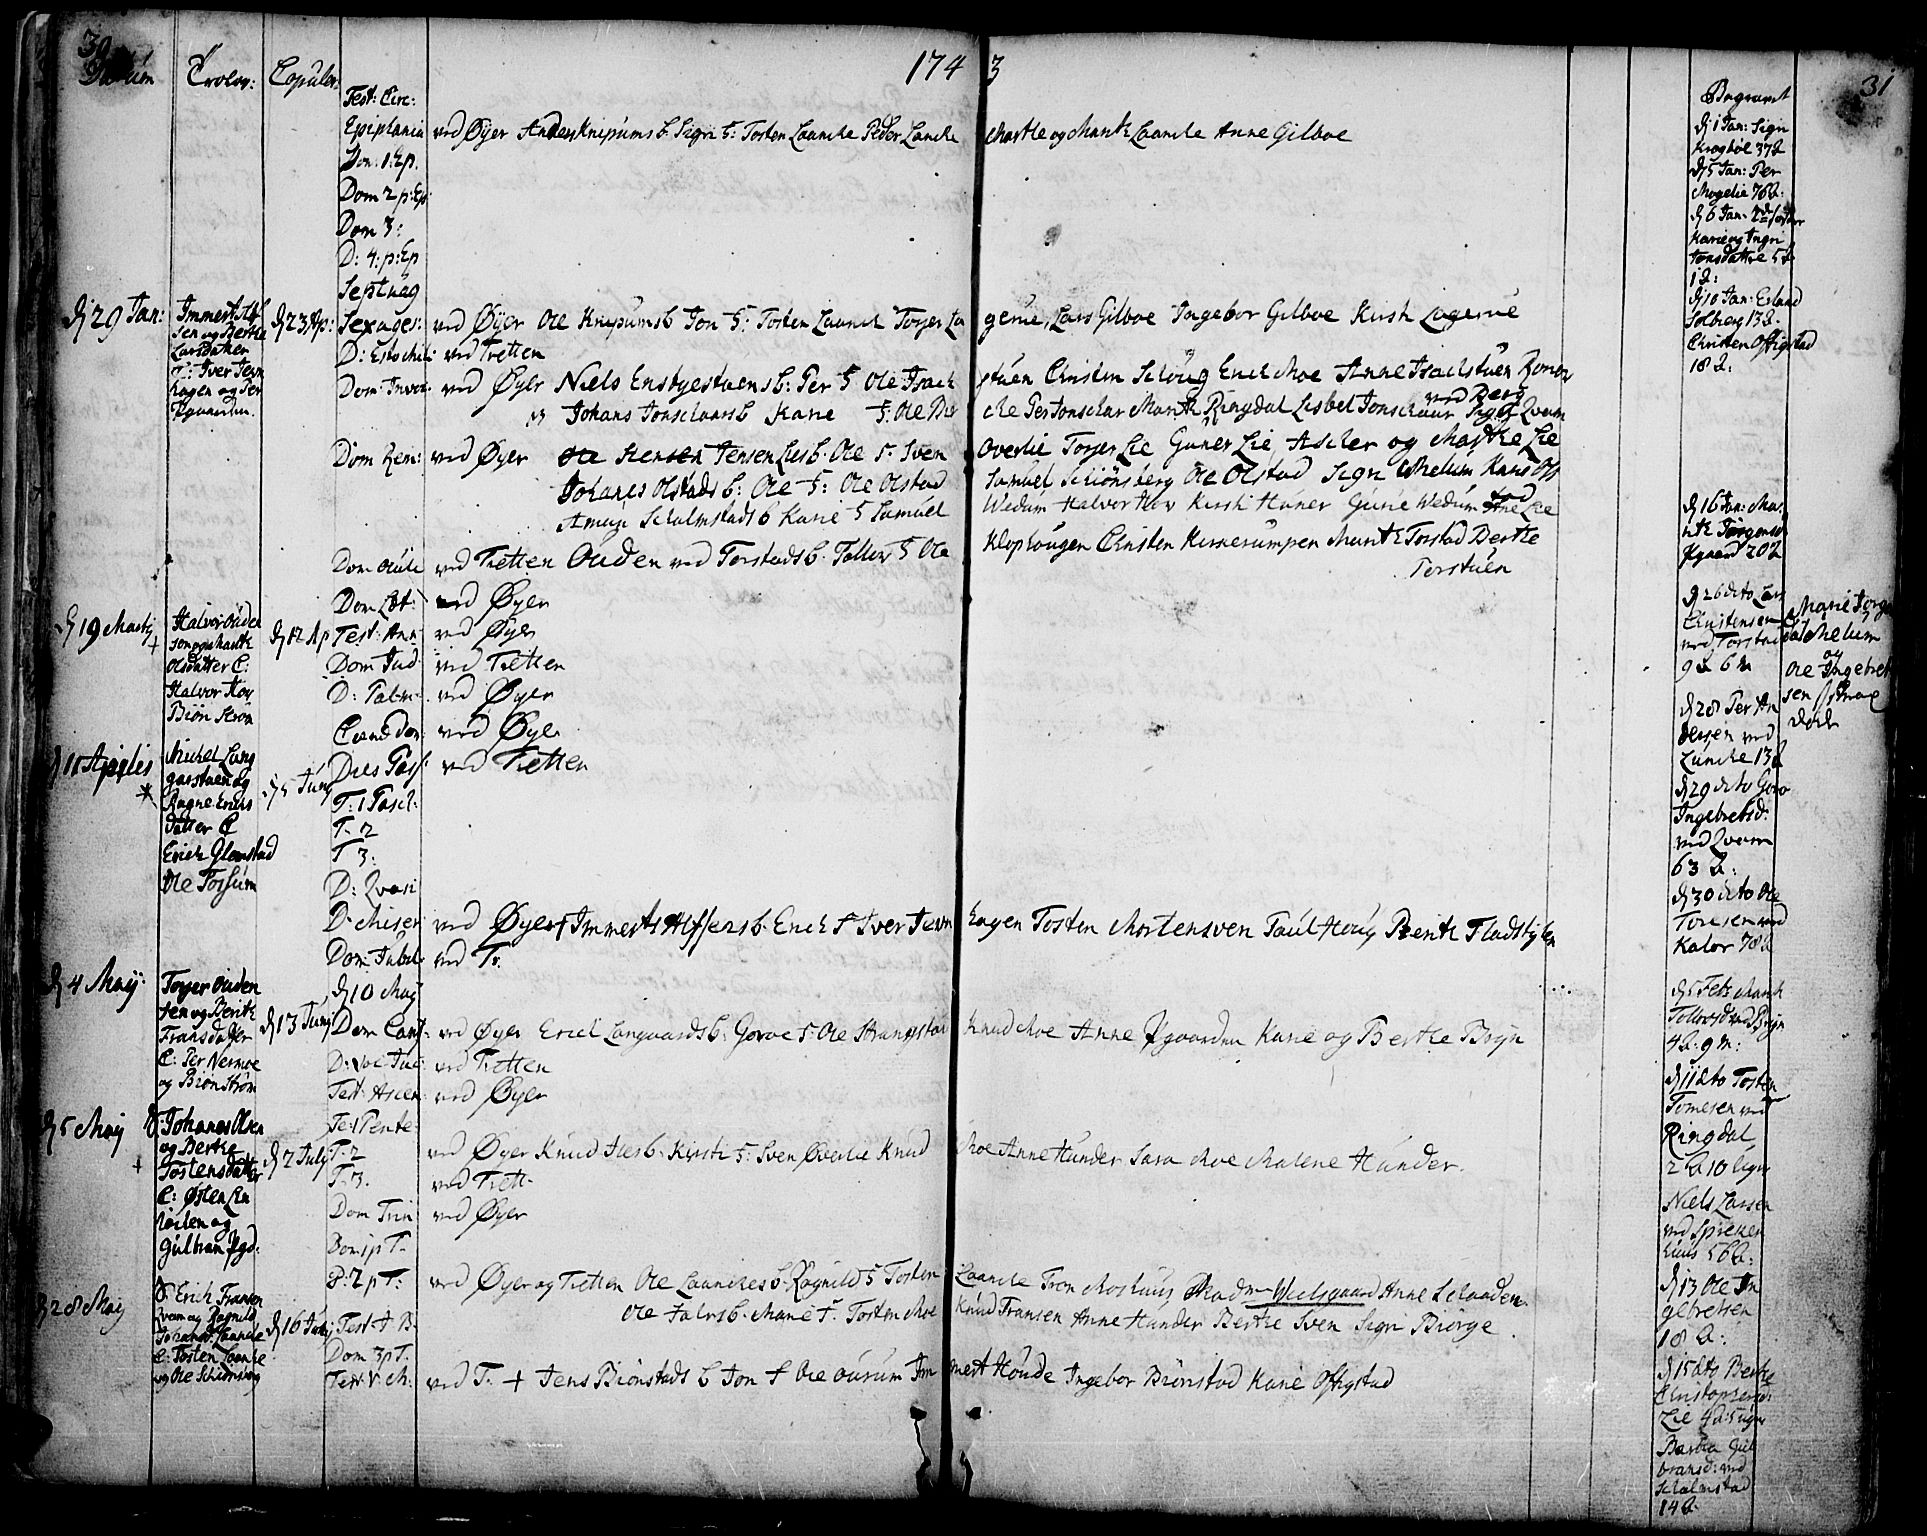 SAH, Øyer prestekontor, Ministerialbok nr. 2, 1733-1784, s. 30-31